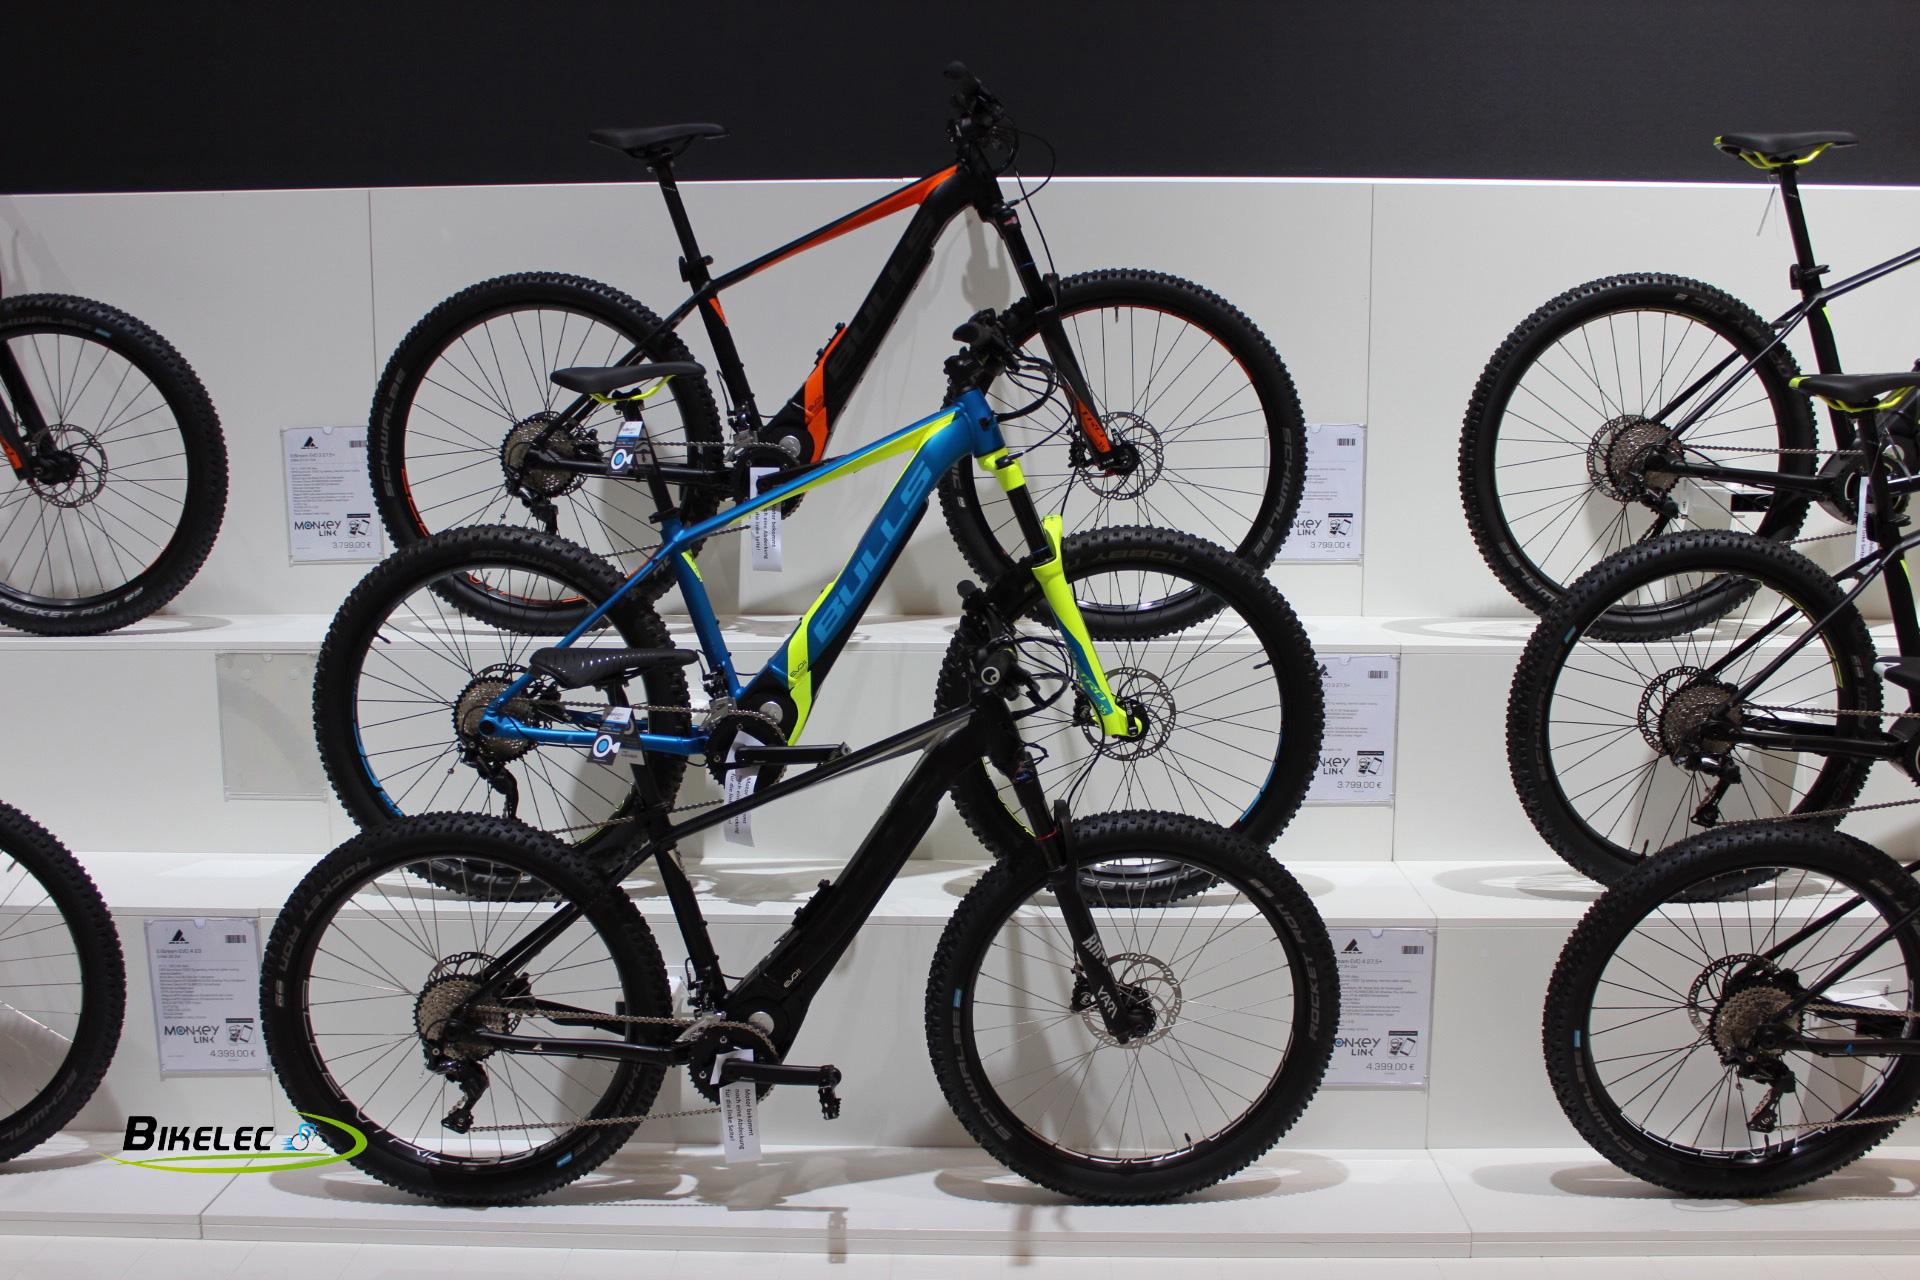 Novedades Bulls Bikes 2018 Motor Brose - Parte 2 - Bicicletas Eléctricas